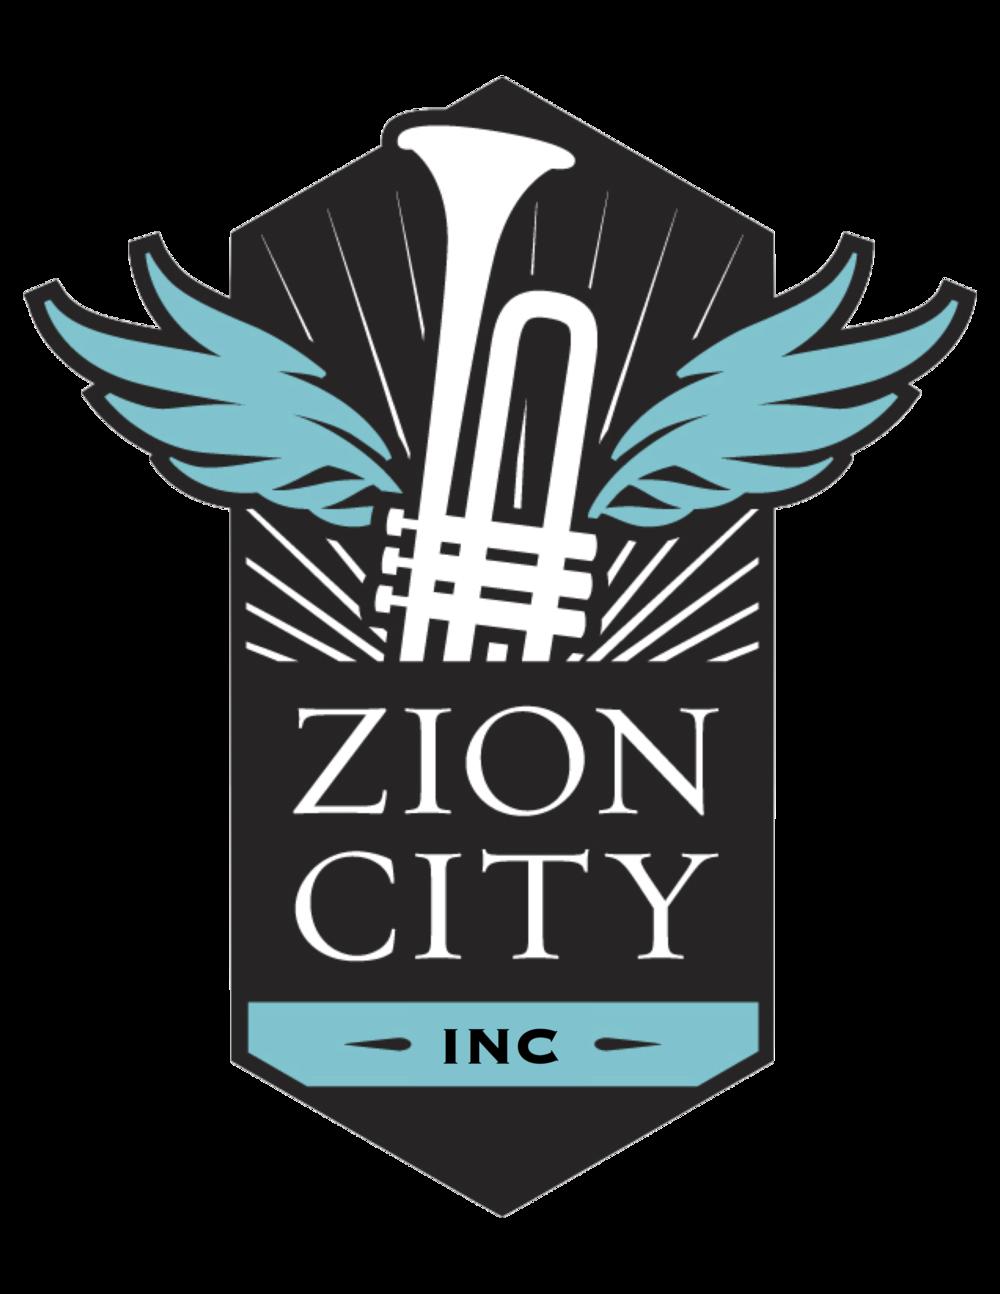 www zioncity org, www easeyoursoul com, www coliermnair com